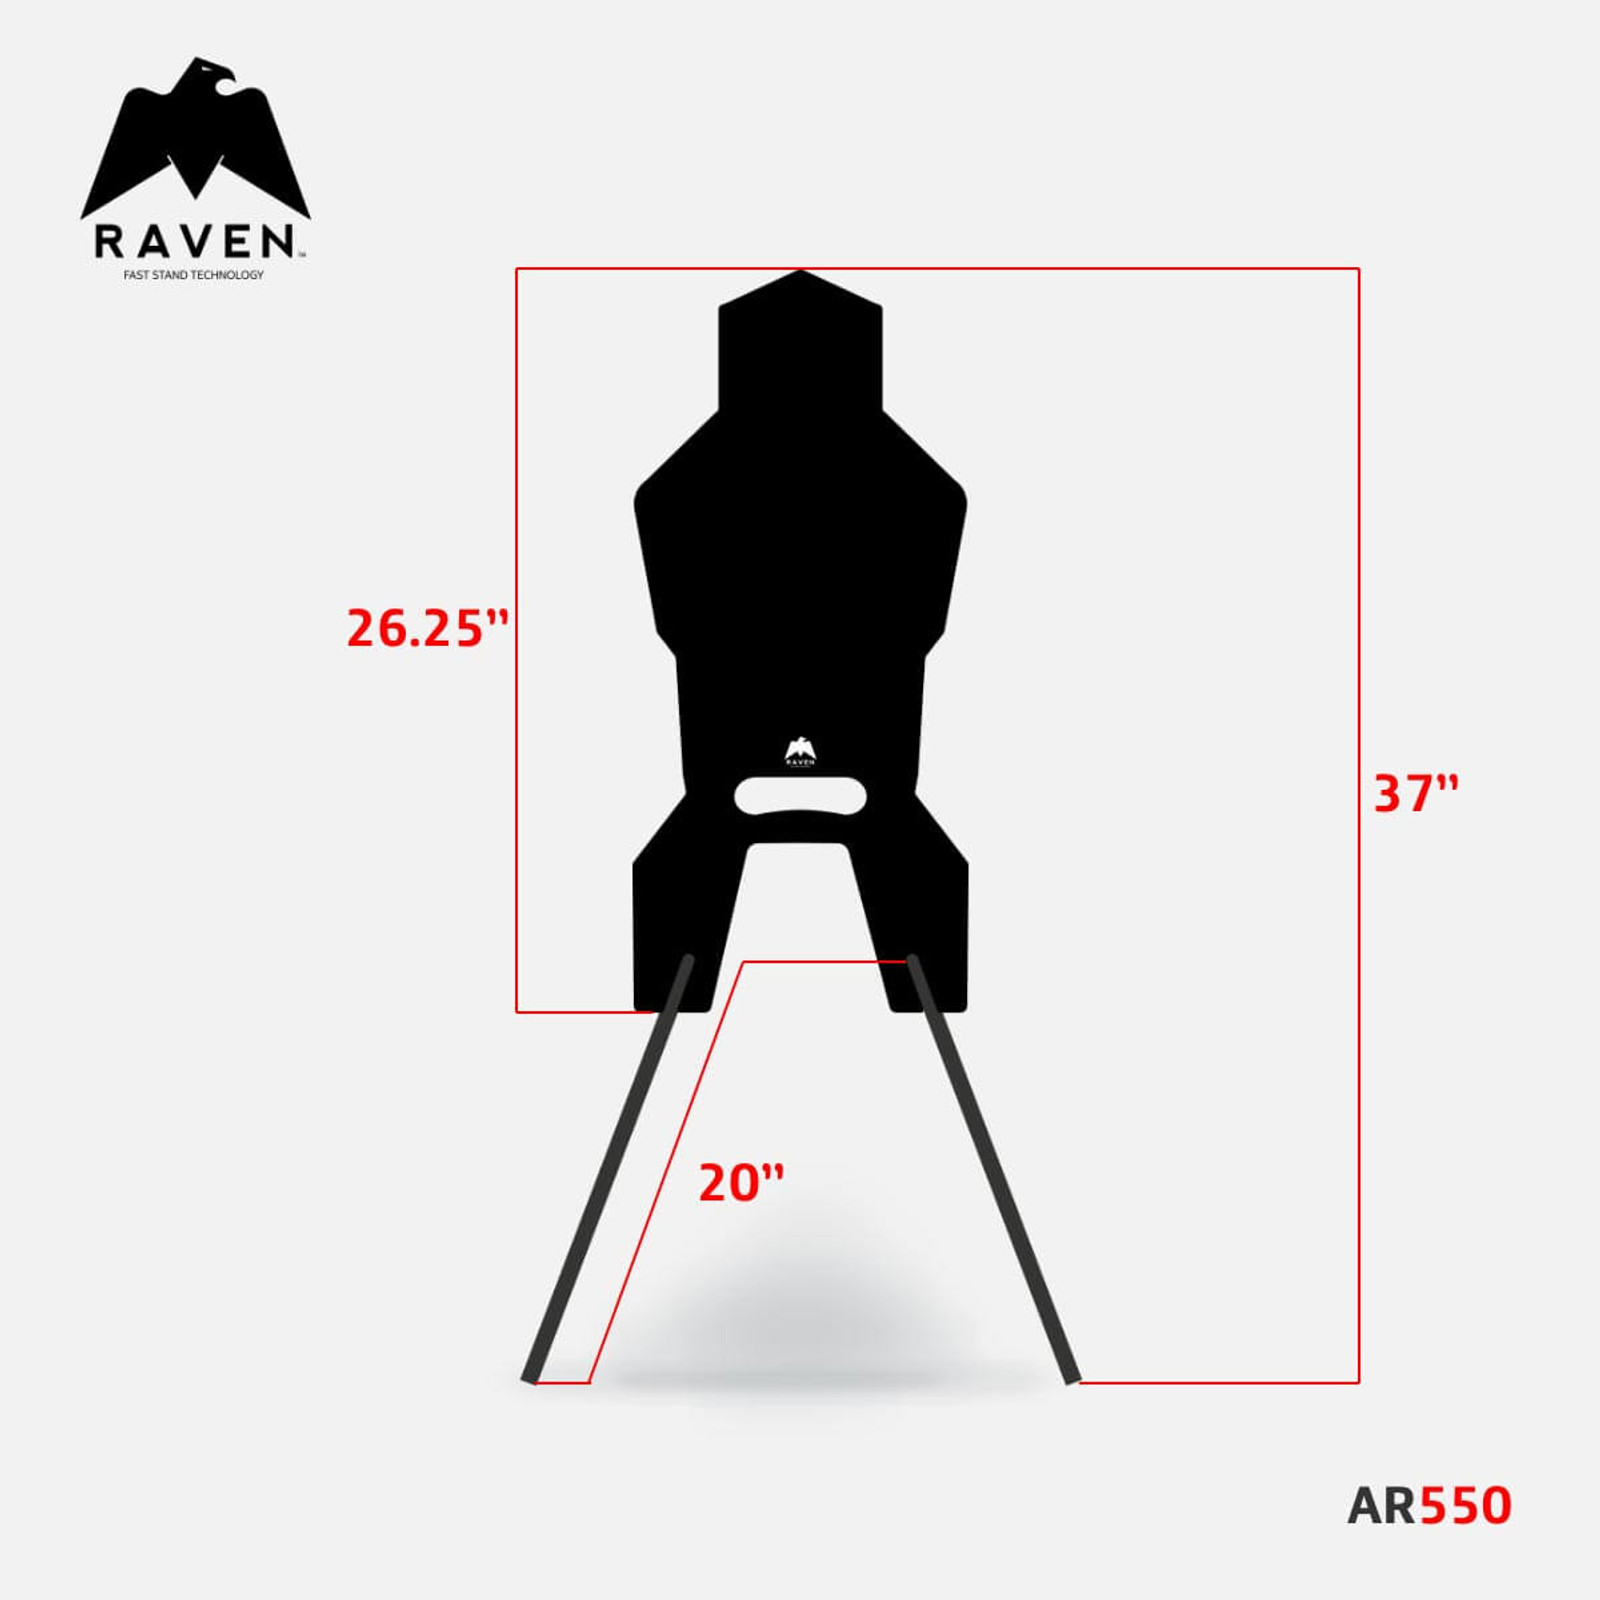 RAVEN AR550 Steel Target Stand